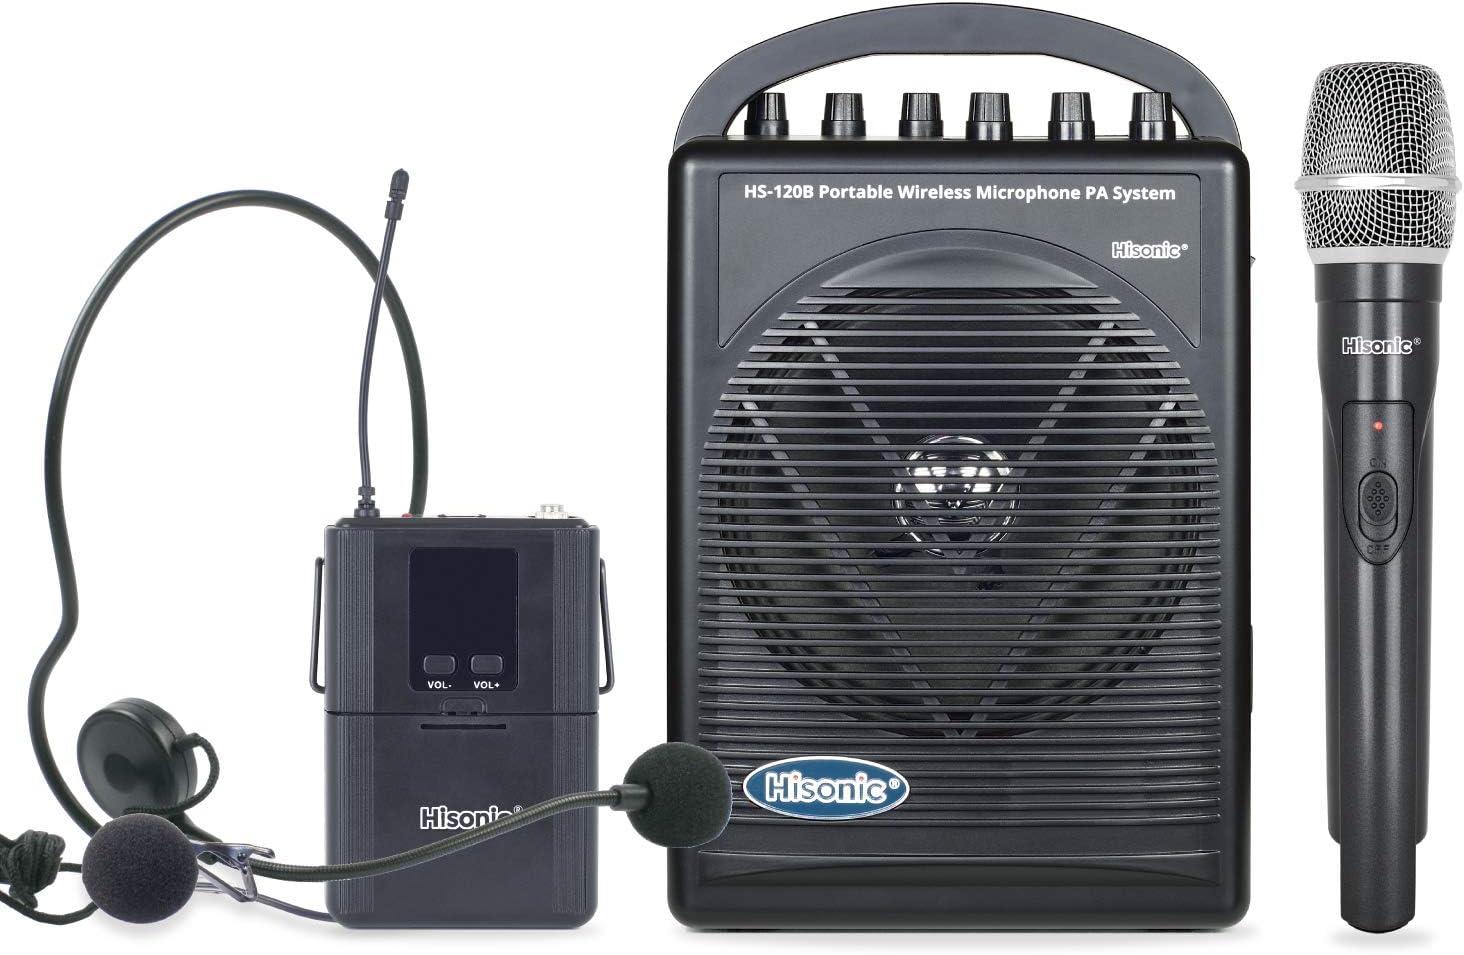 Hisonic Hs120B Rechargeable & Portable Pa (Public Address) System